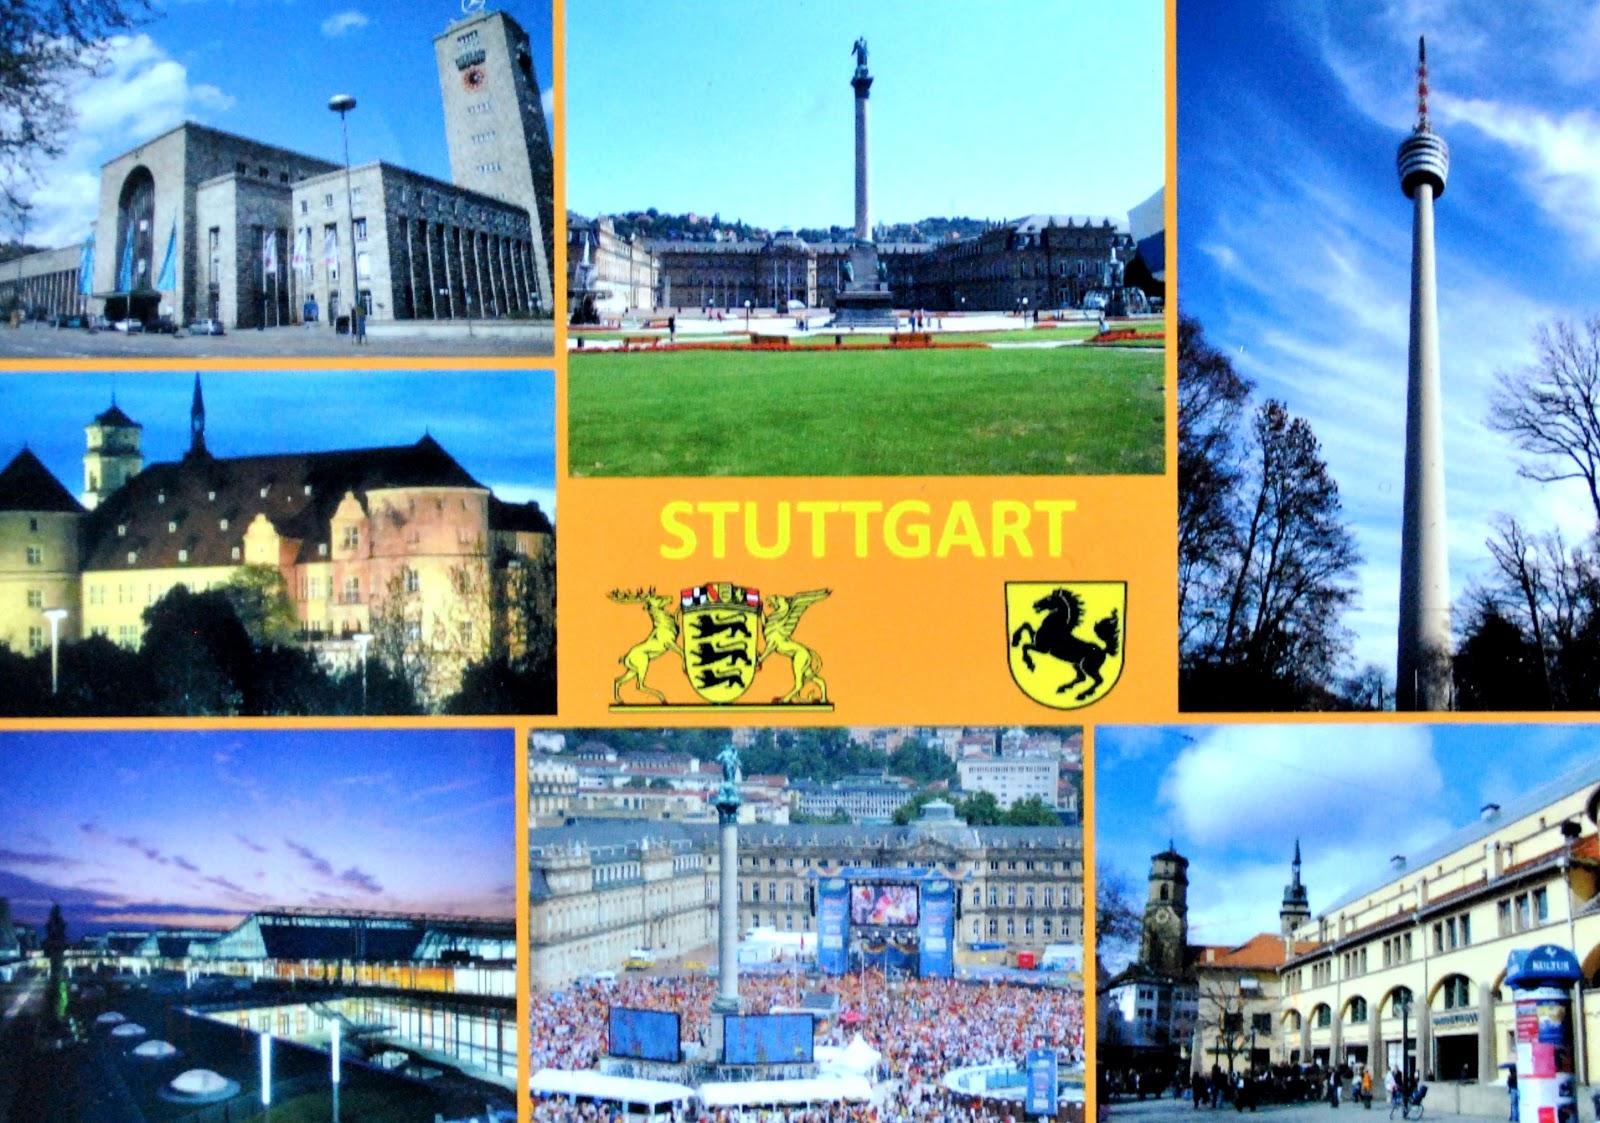 niemcy stuttgart